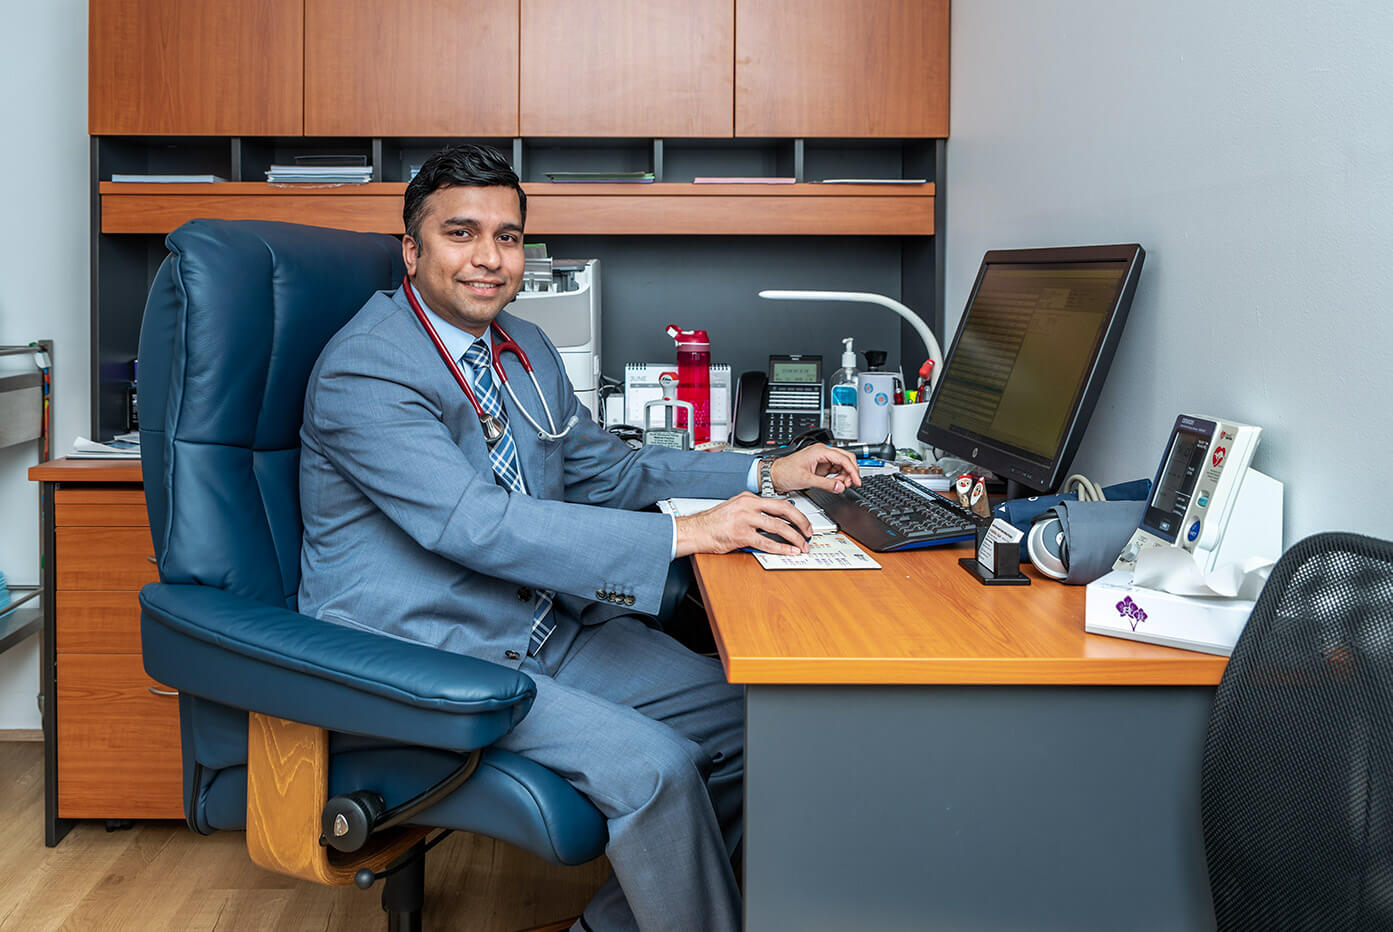 Photo Of Dr. Sazeedul Islam, Practice principal of North richmond family medical practice.